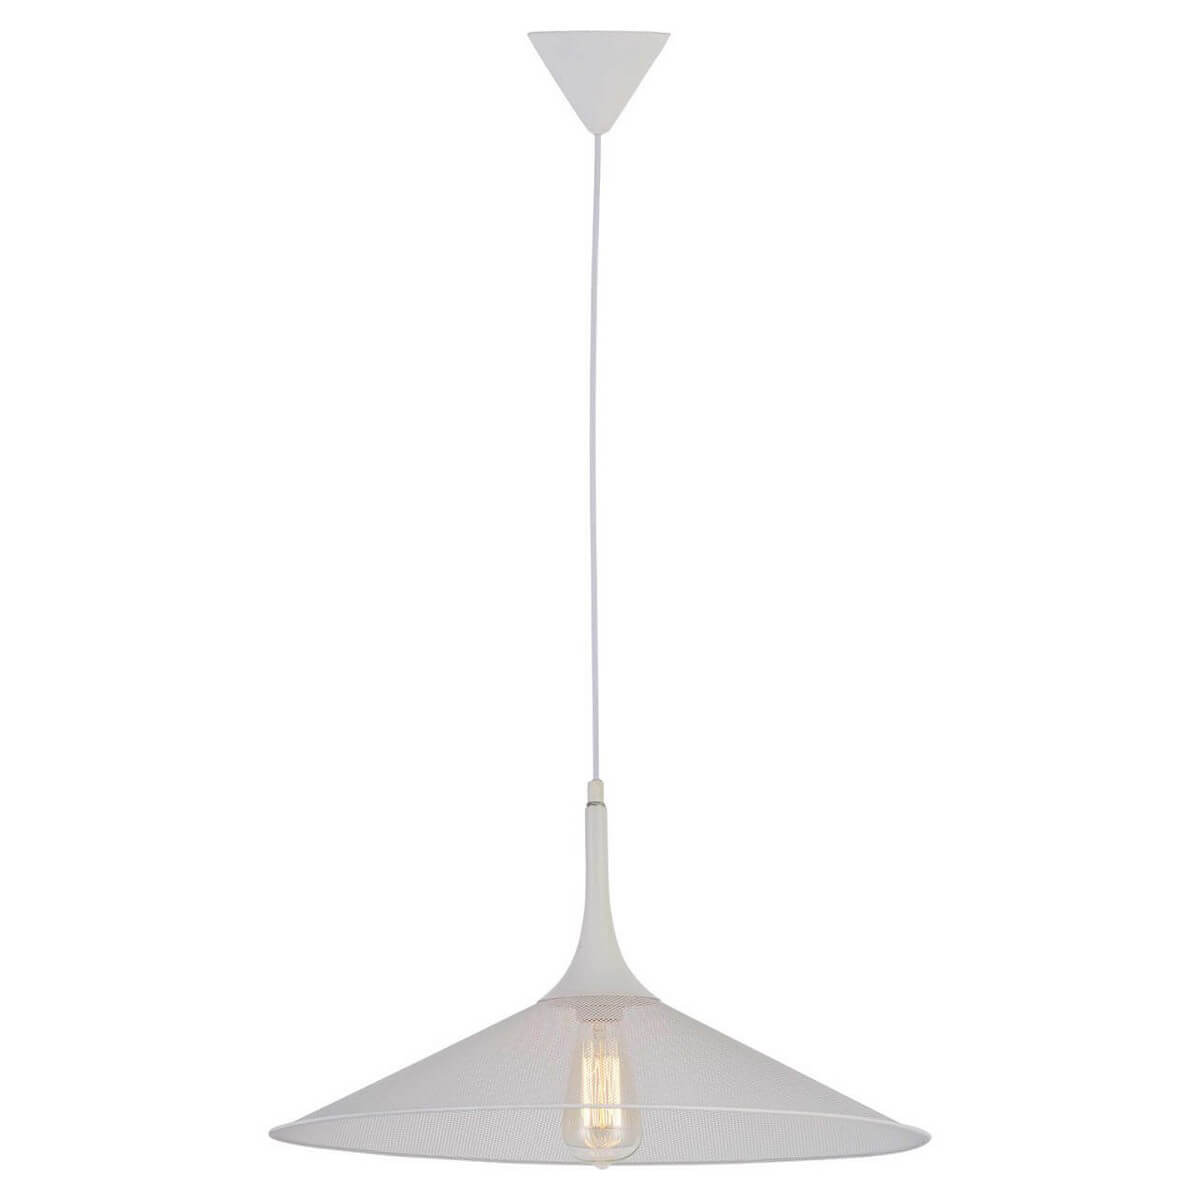 Светильник Lussole LSP-9812 LSP-9812